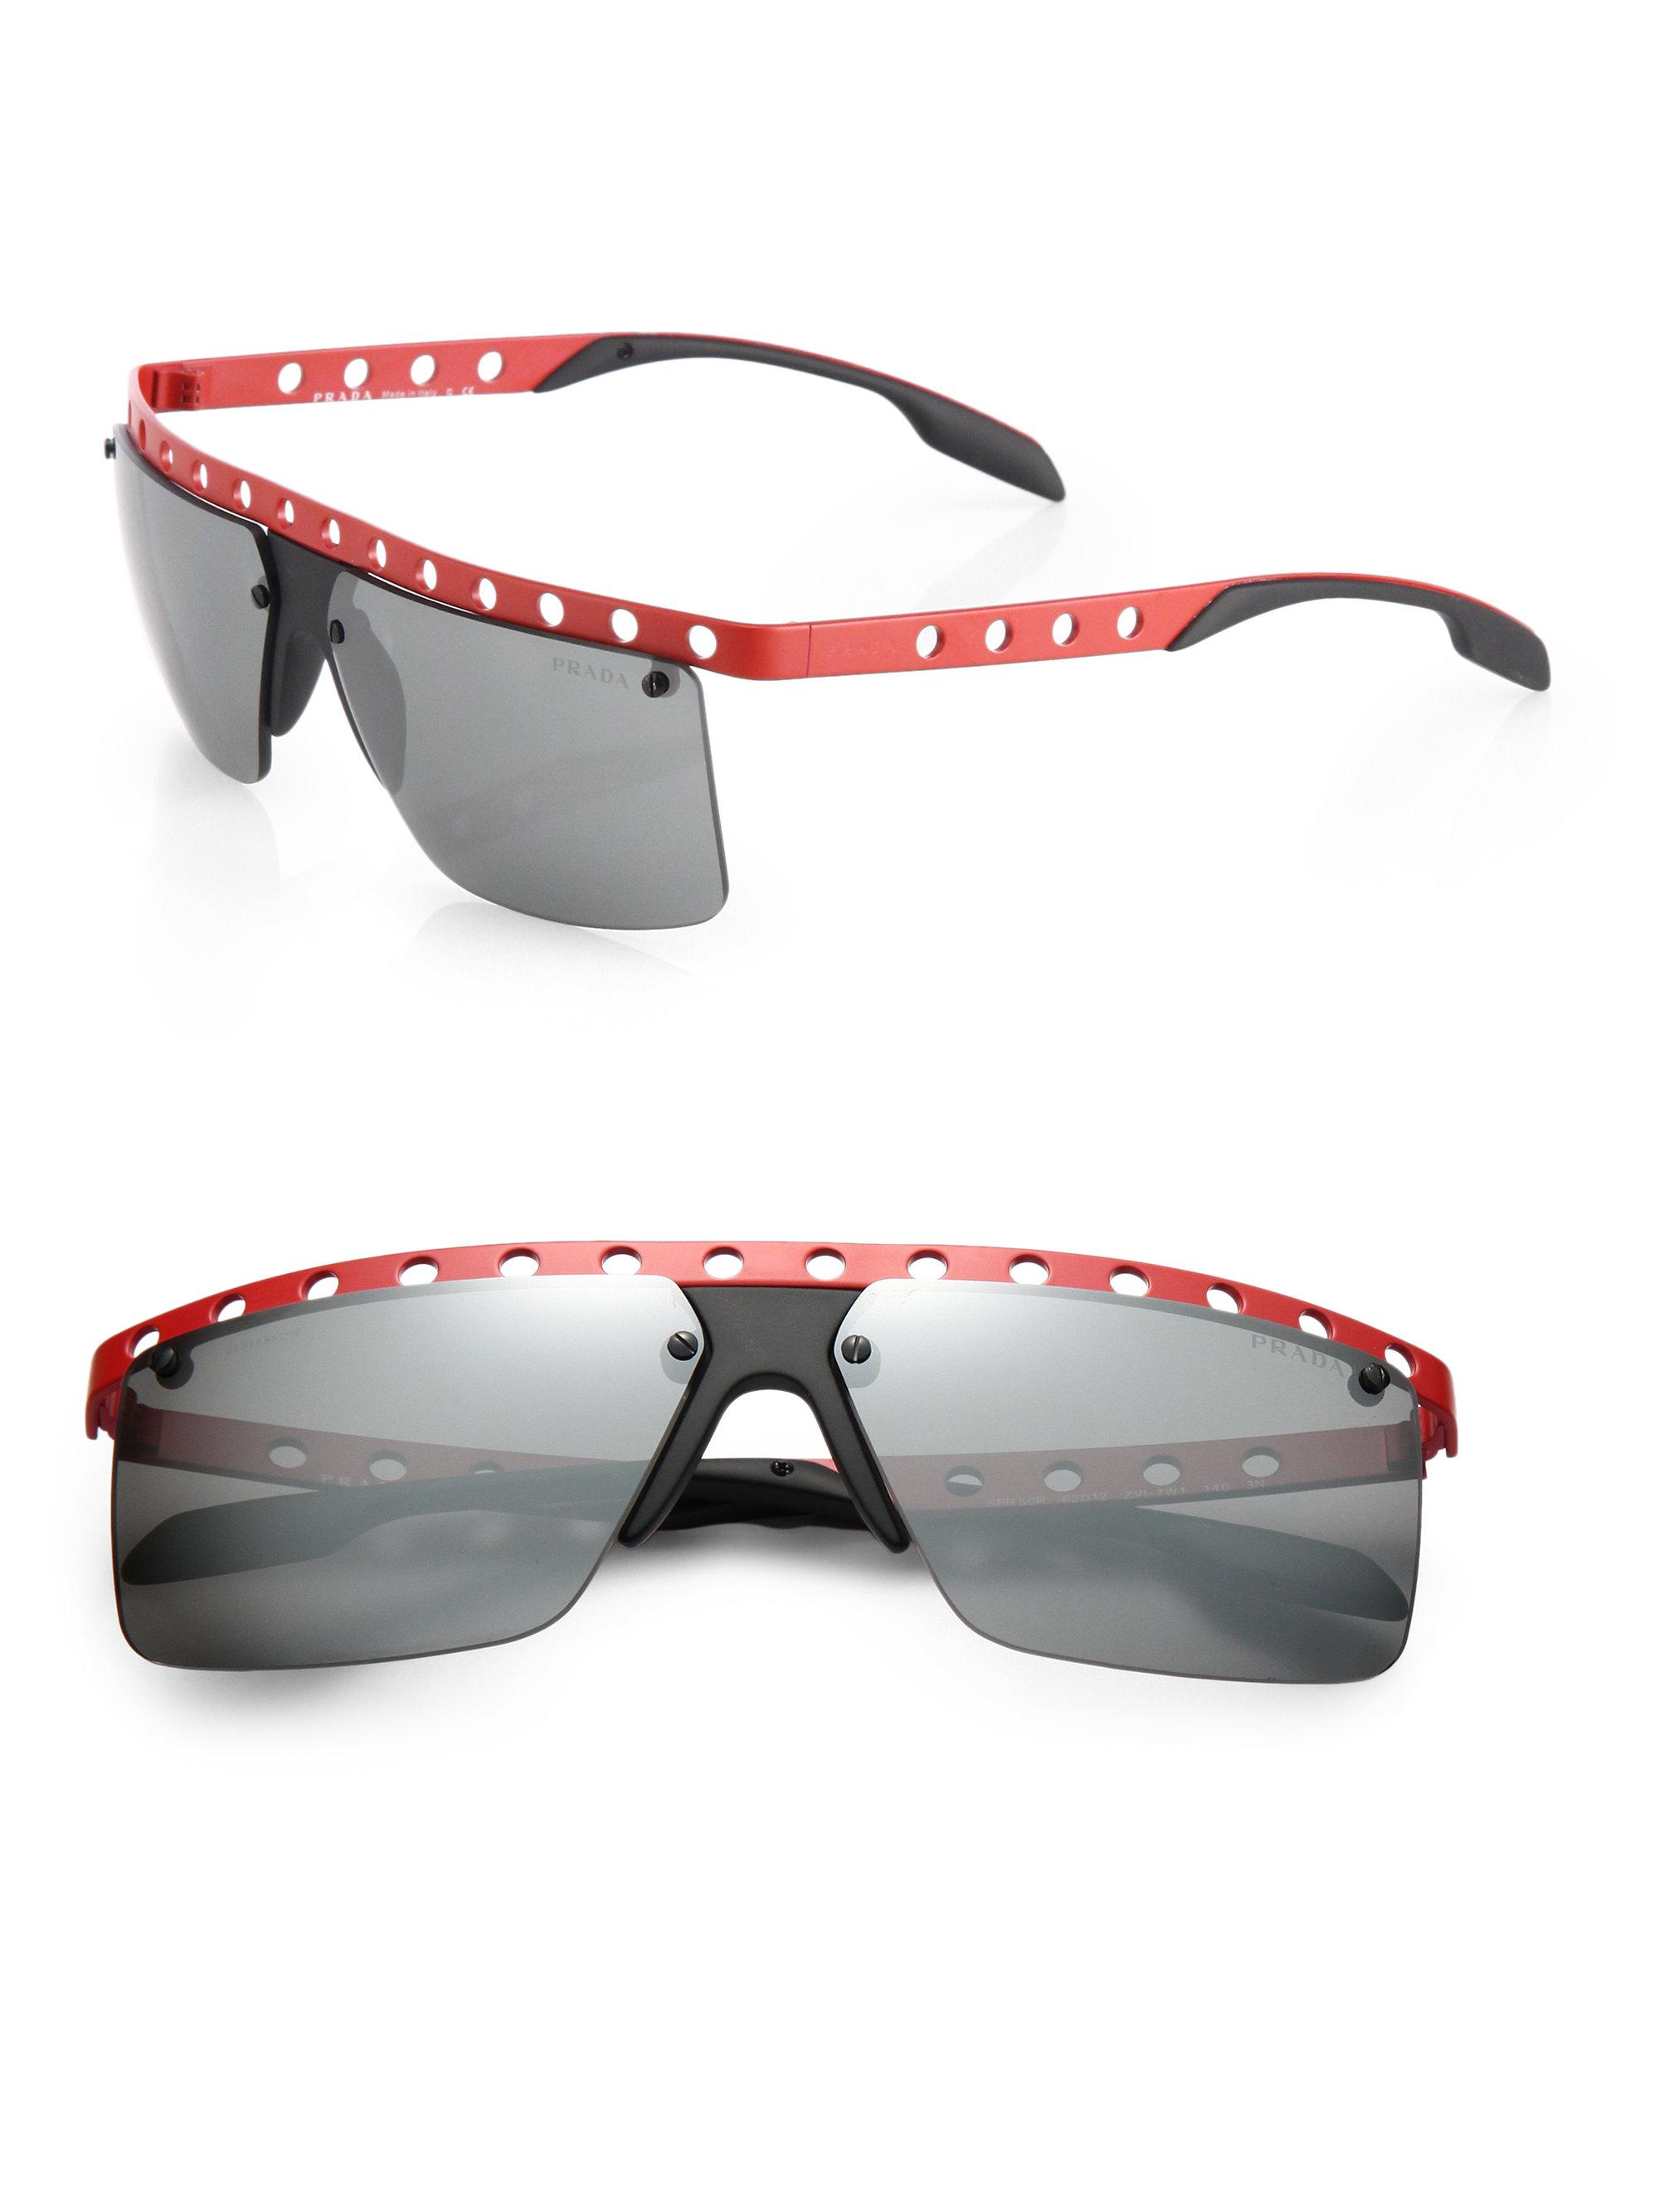 b0058fbef16 Lyst - Prada 62mm Perforated Metal Rimless Rectangle Sunglasses in ...